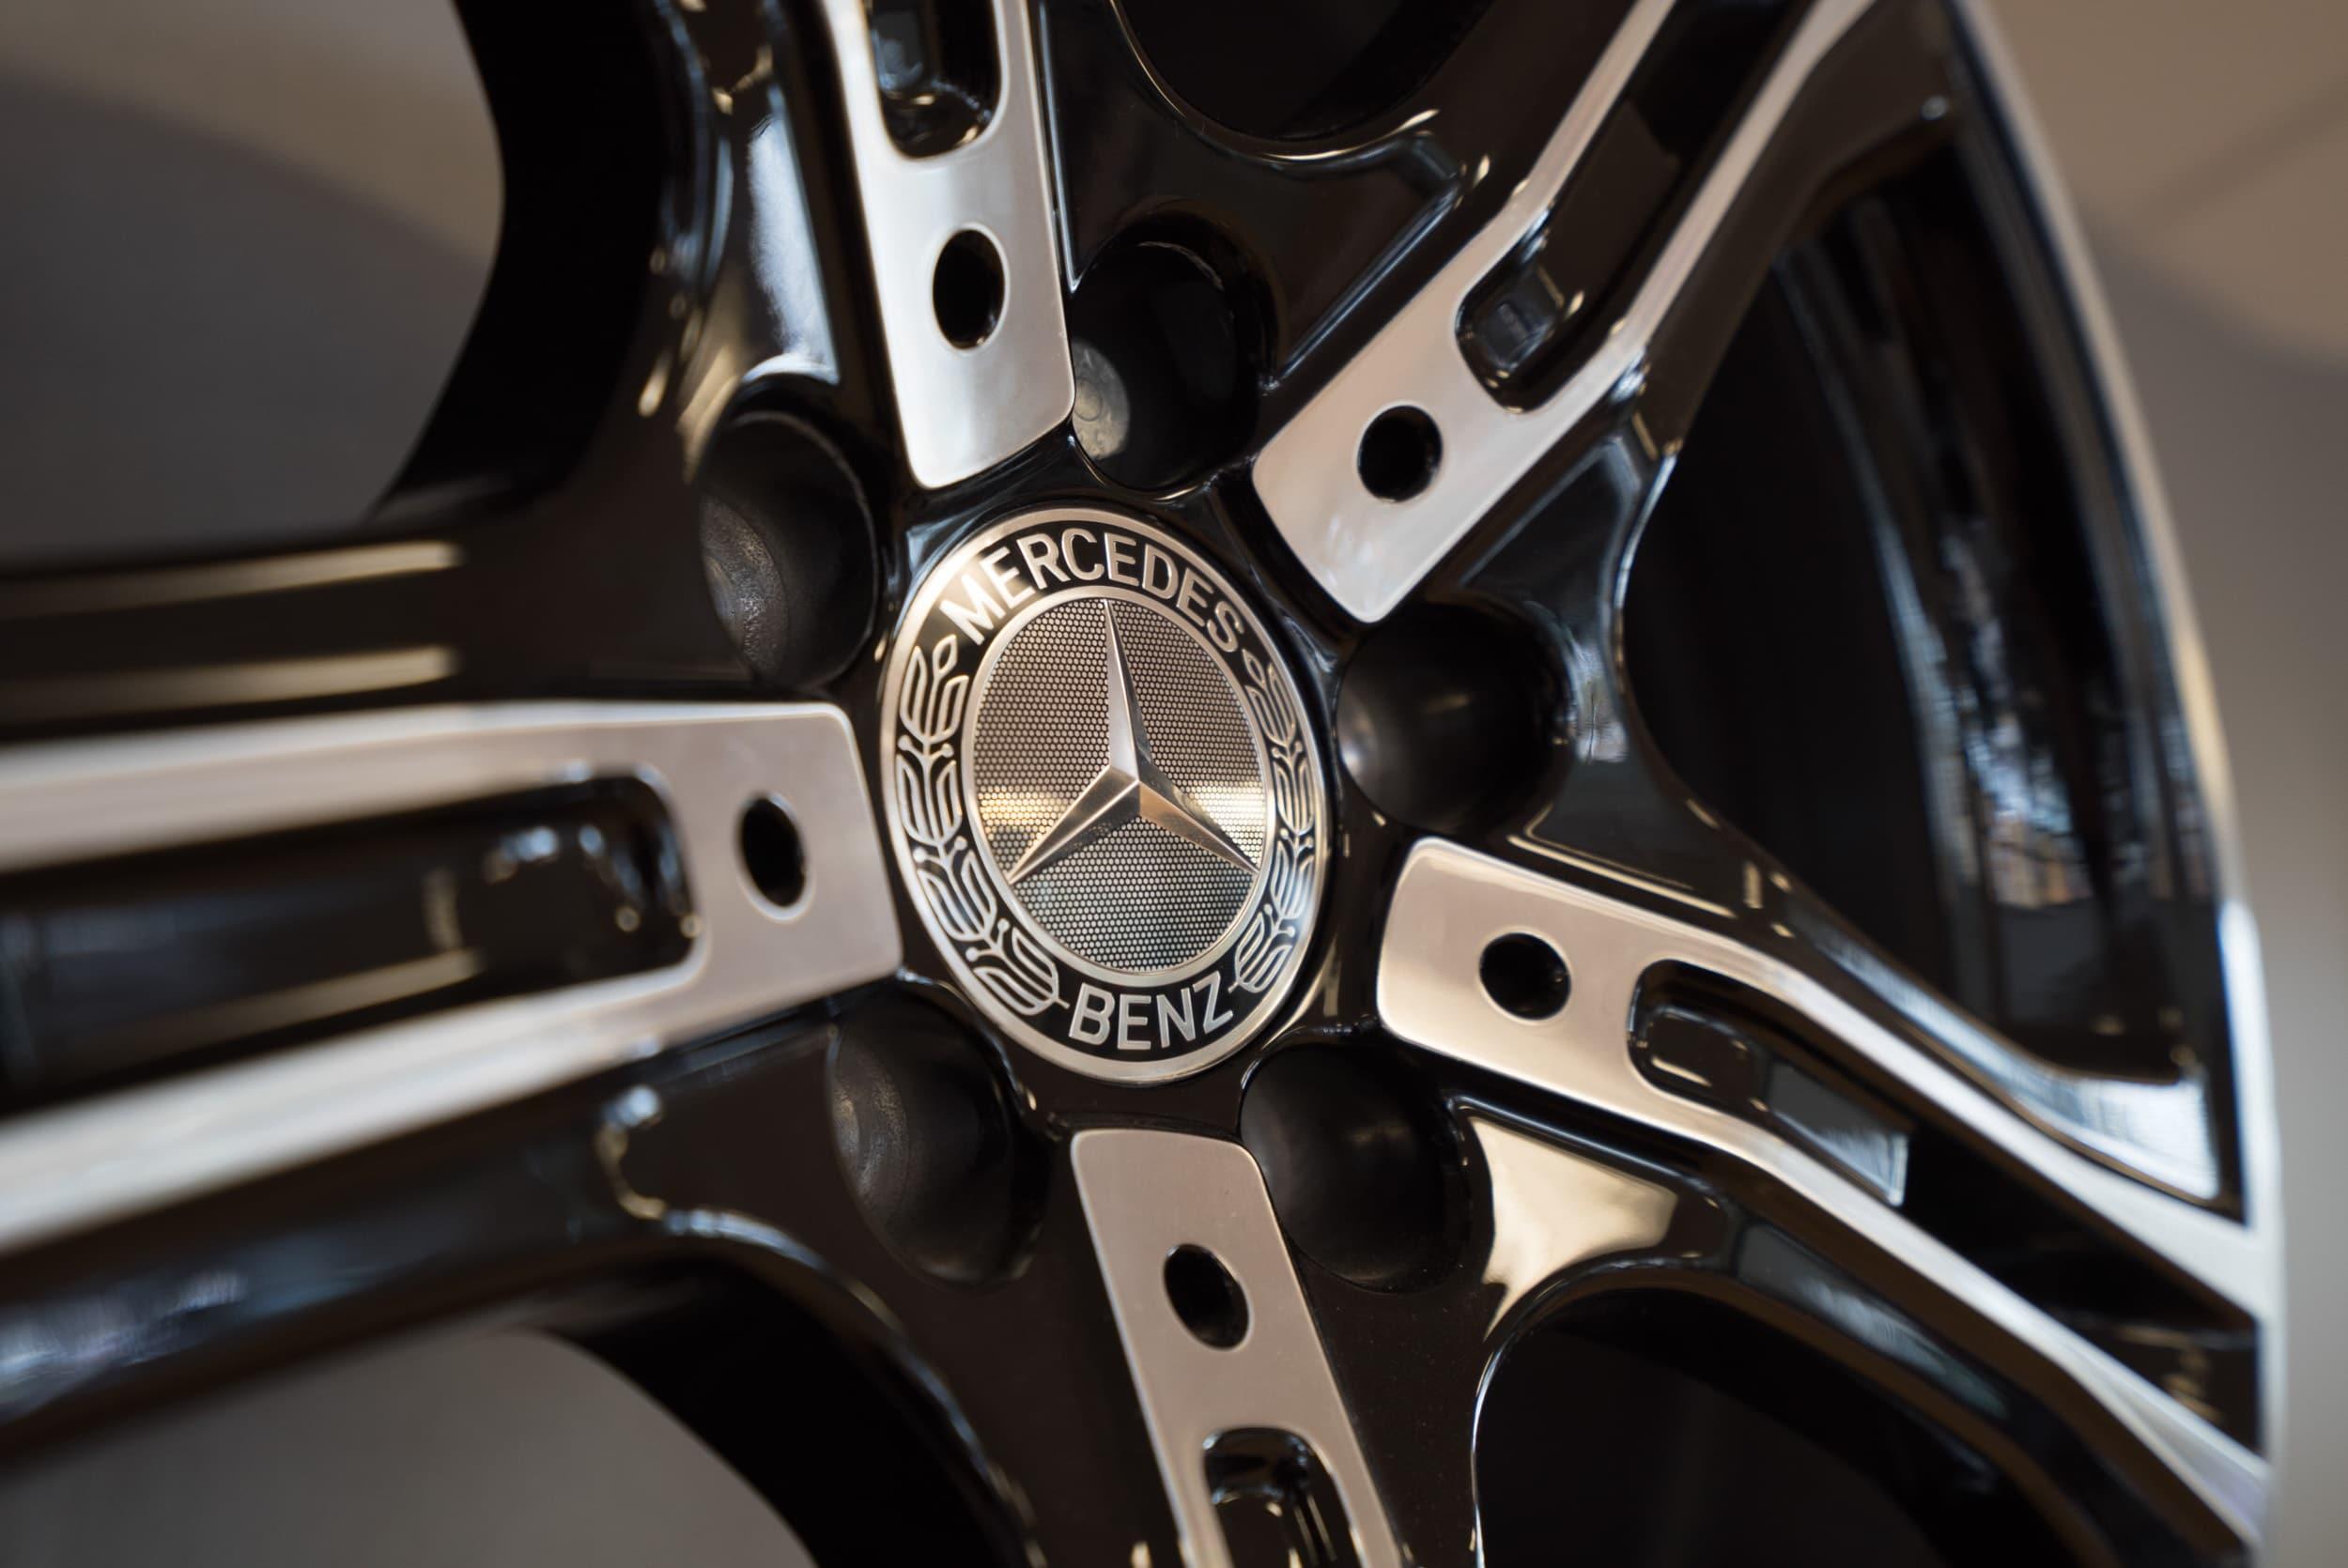 Mercedes benz dealer near me sarasota fl mercedes benz for Mercedes benz chantilly service